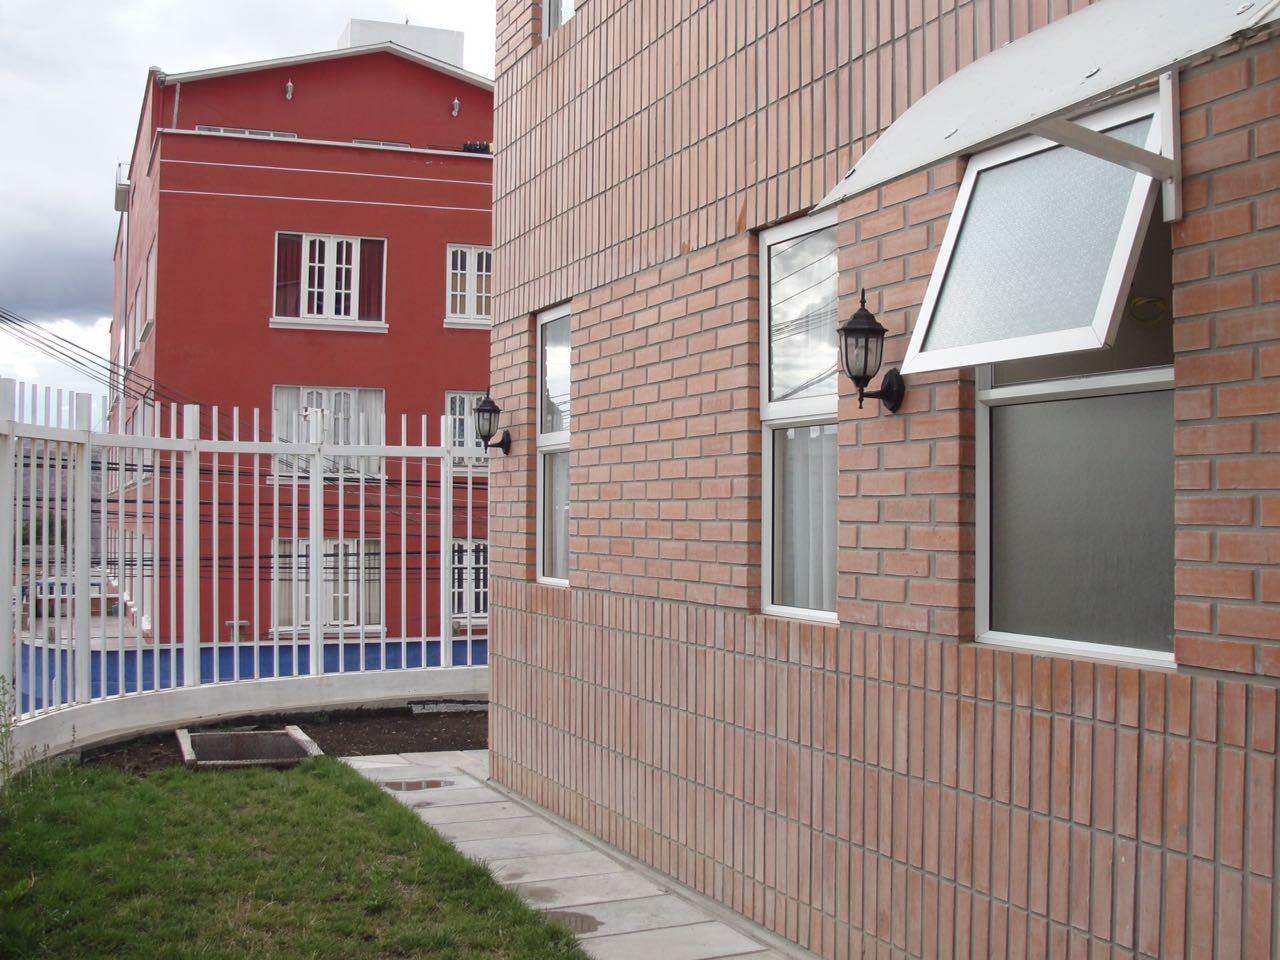 Departamento en Alquiler COTA COTA, BONITO DEPARTAMENTO EN ALQUILER Foto 5